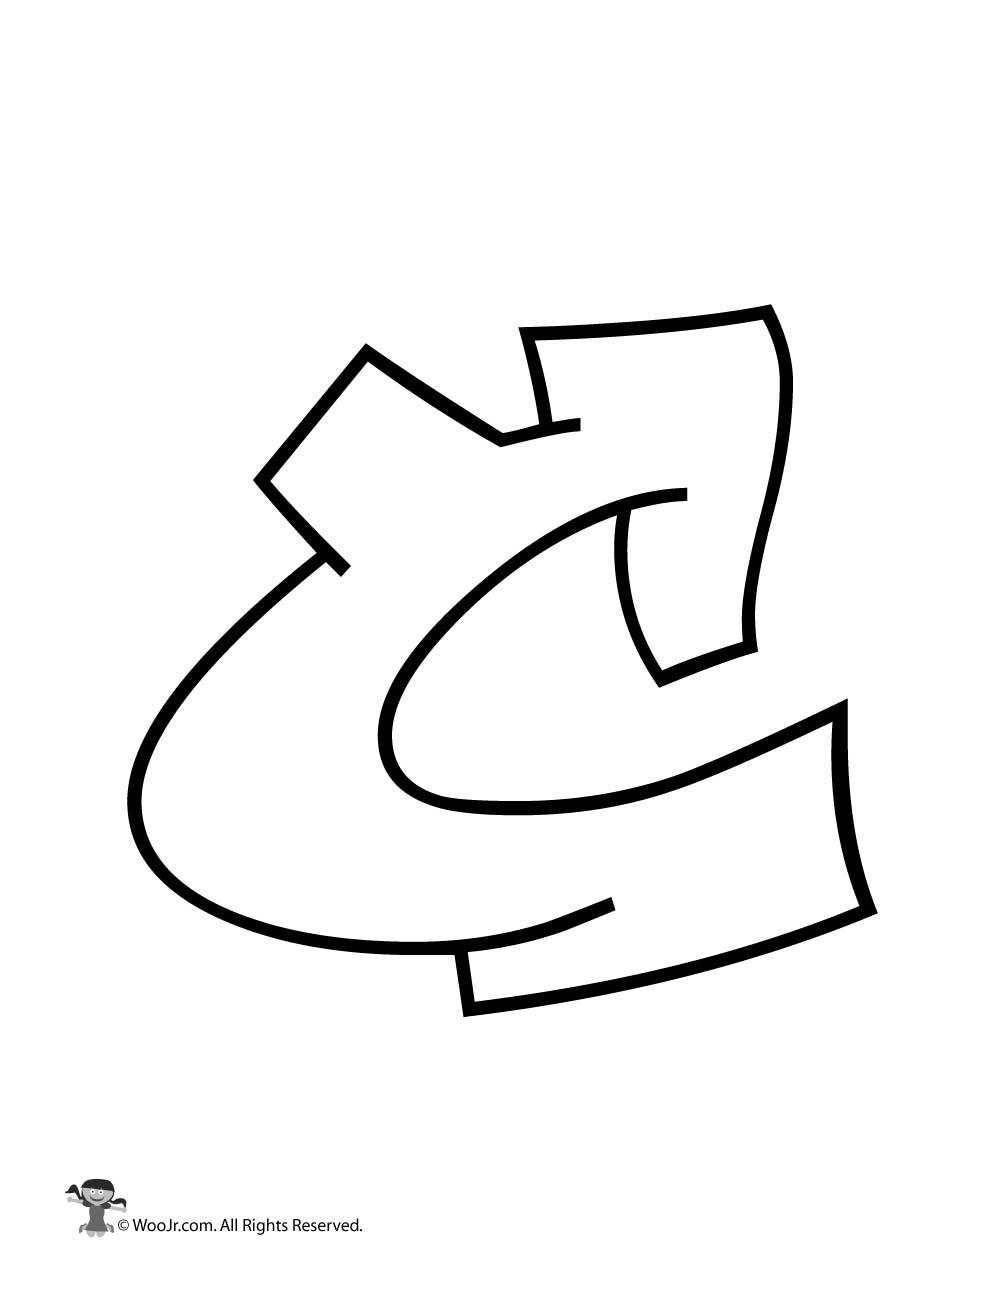 Graffiti Capital Letter C Woo Jr Kids Activities